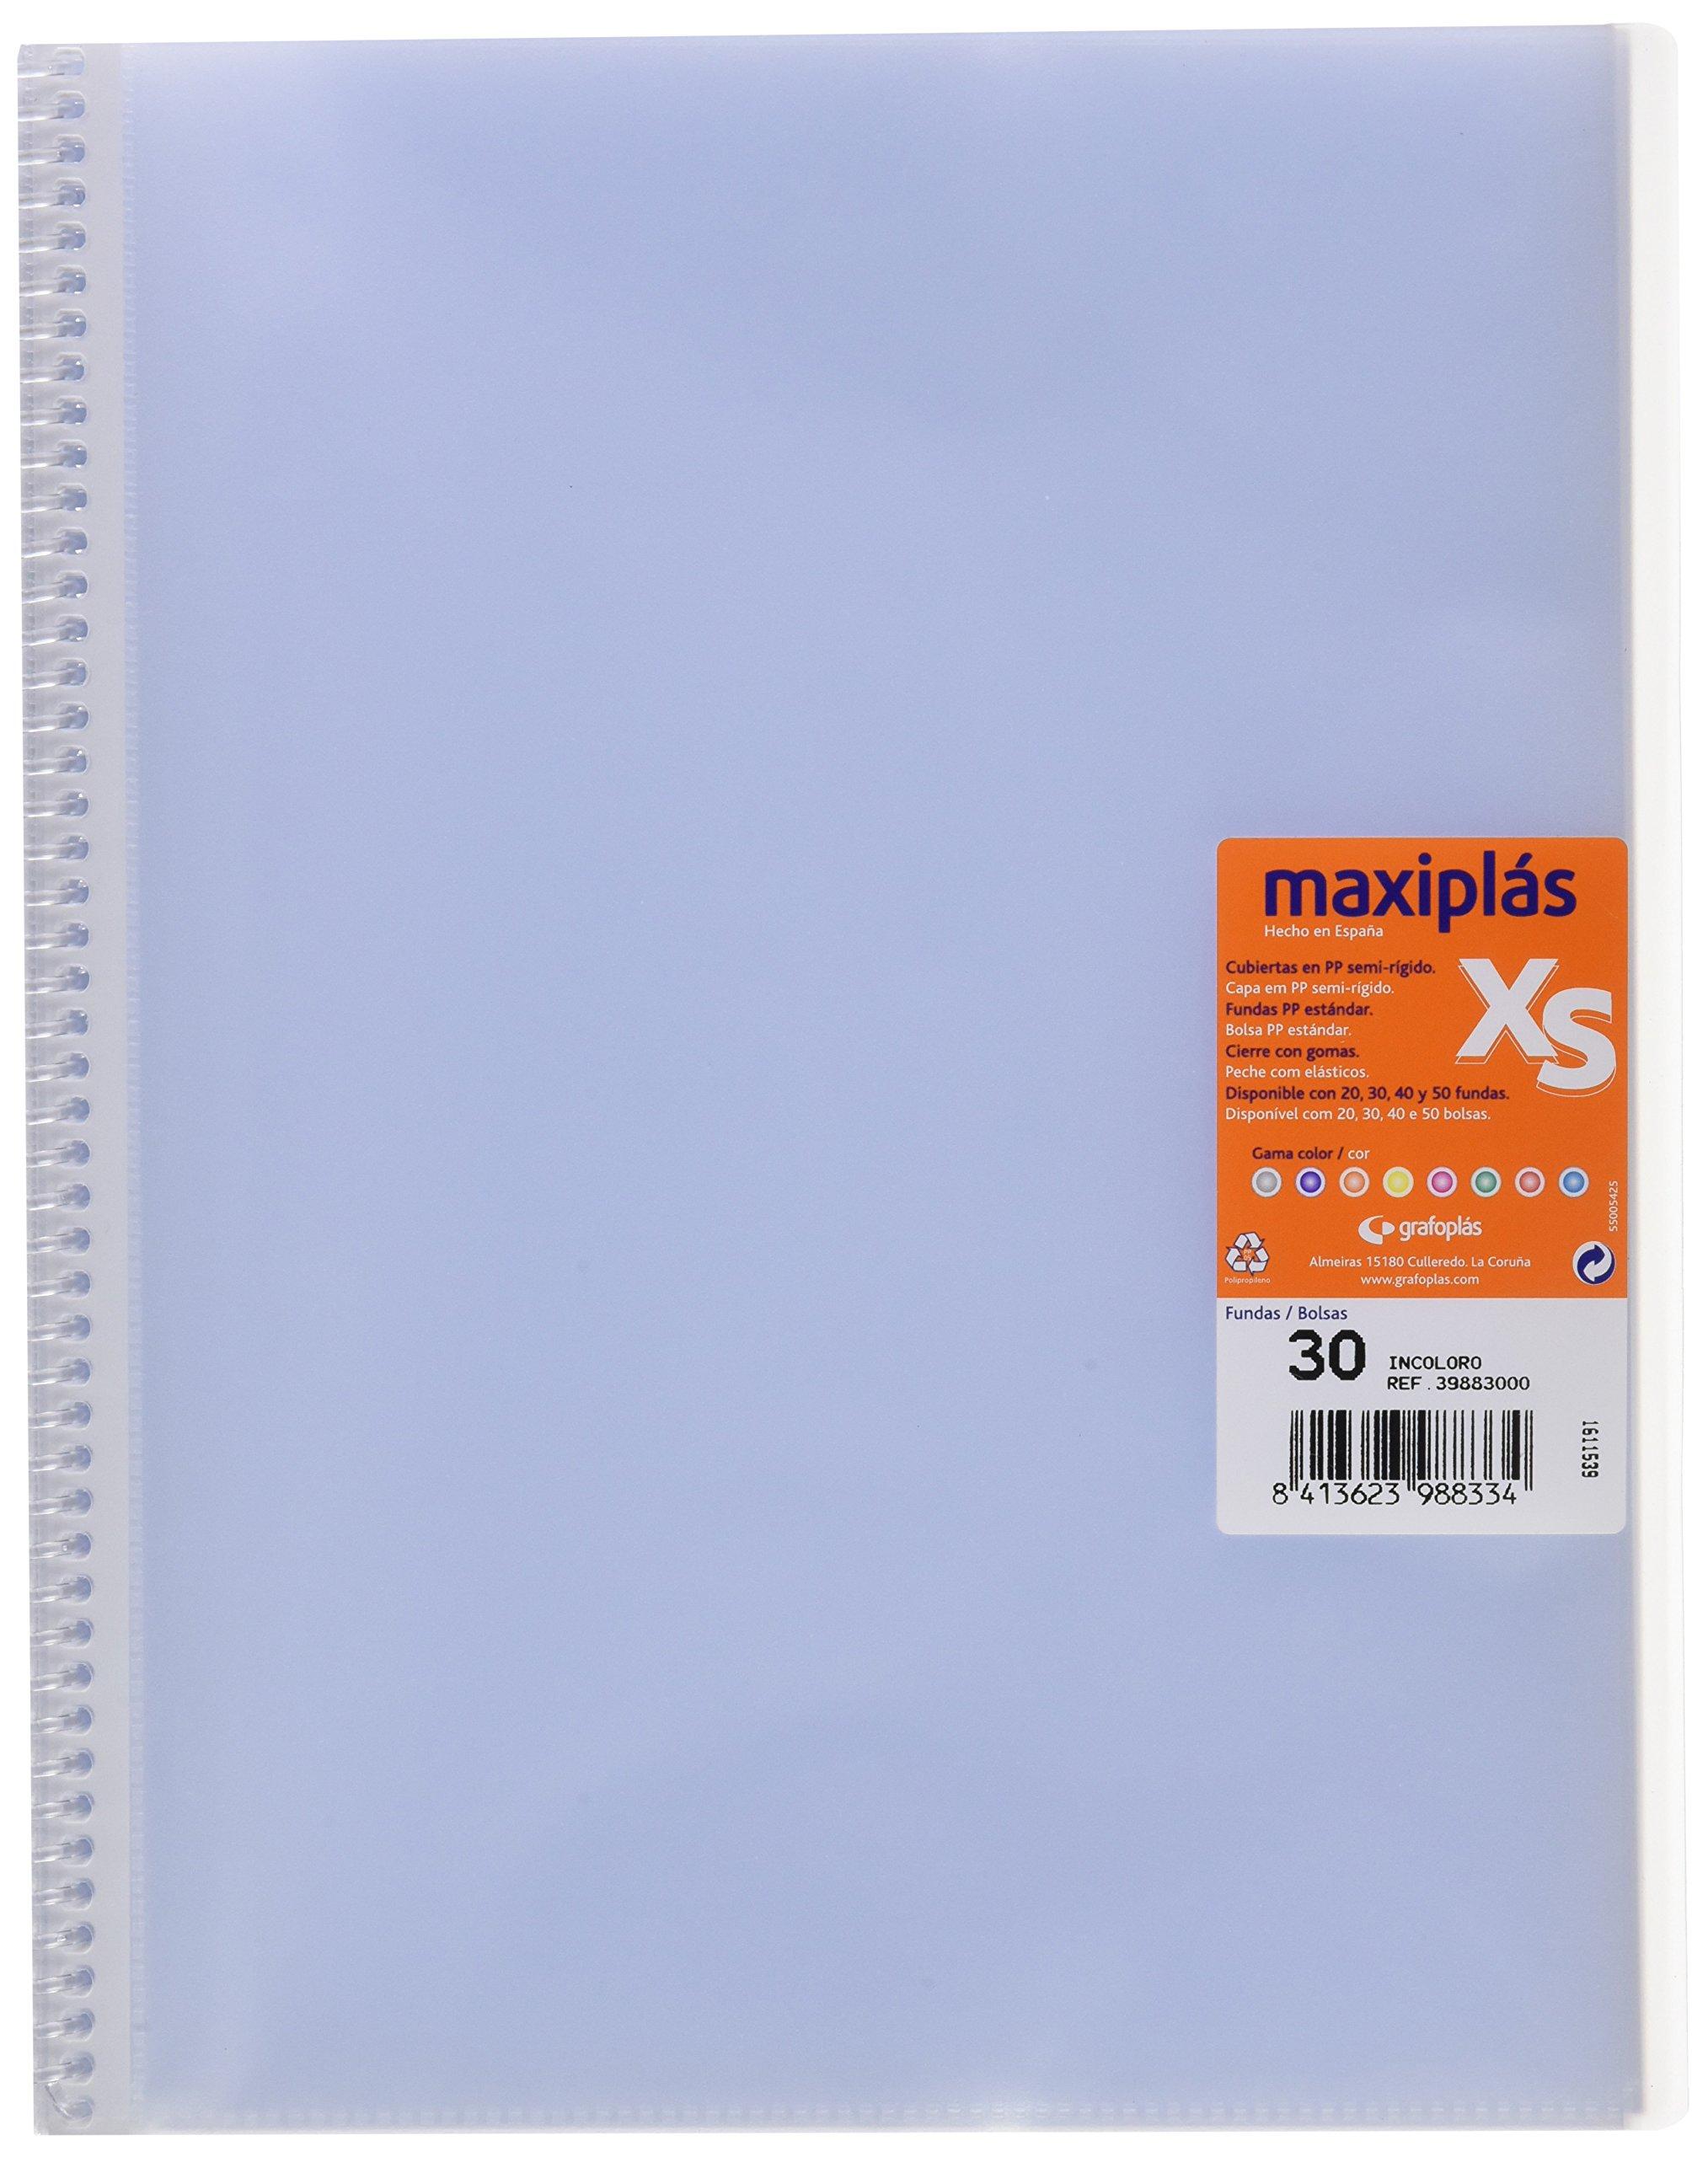 grafoplas 39883000Folder–30Pockets, A4, Tapas PP, Transparent